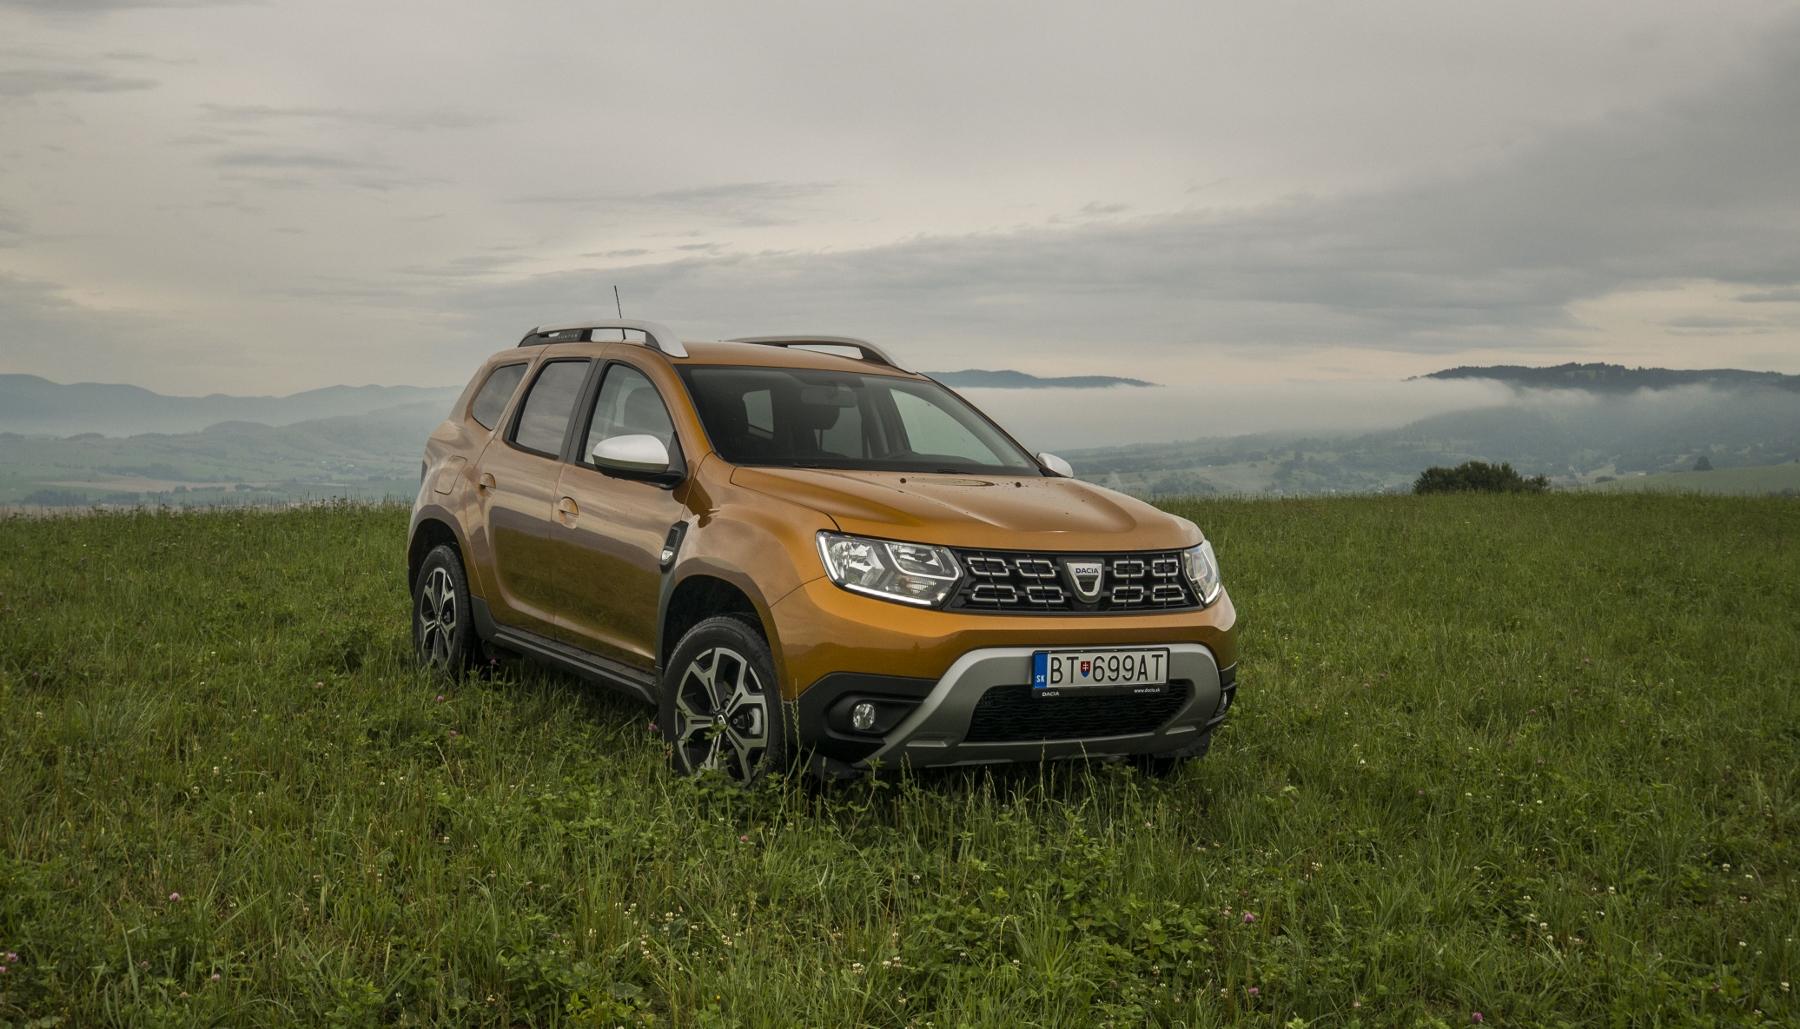 Test: Dacia Duster LPG je voľbou rozumu w11XR6d5Cb dacia-duster-lpg-14